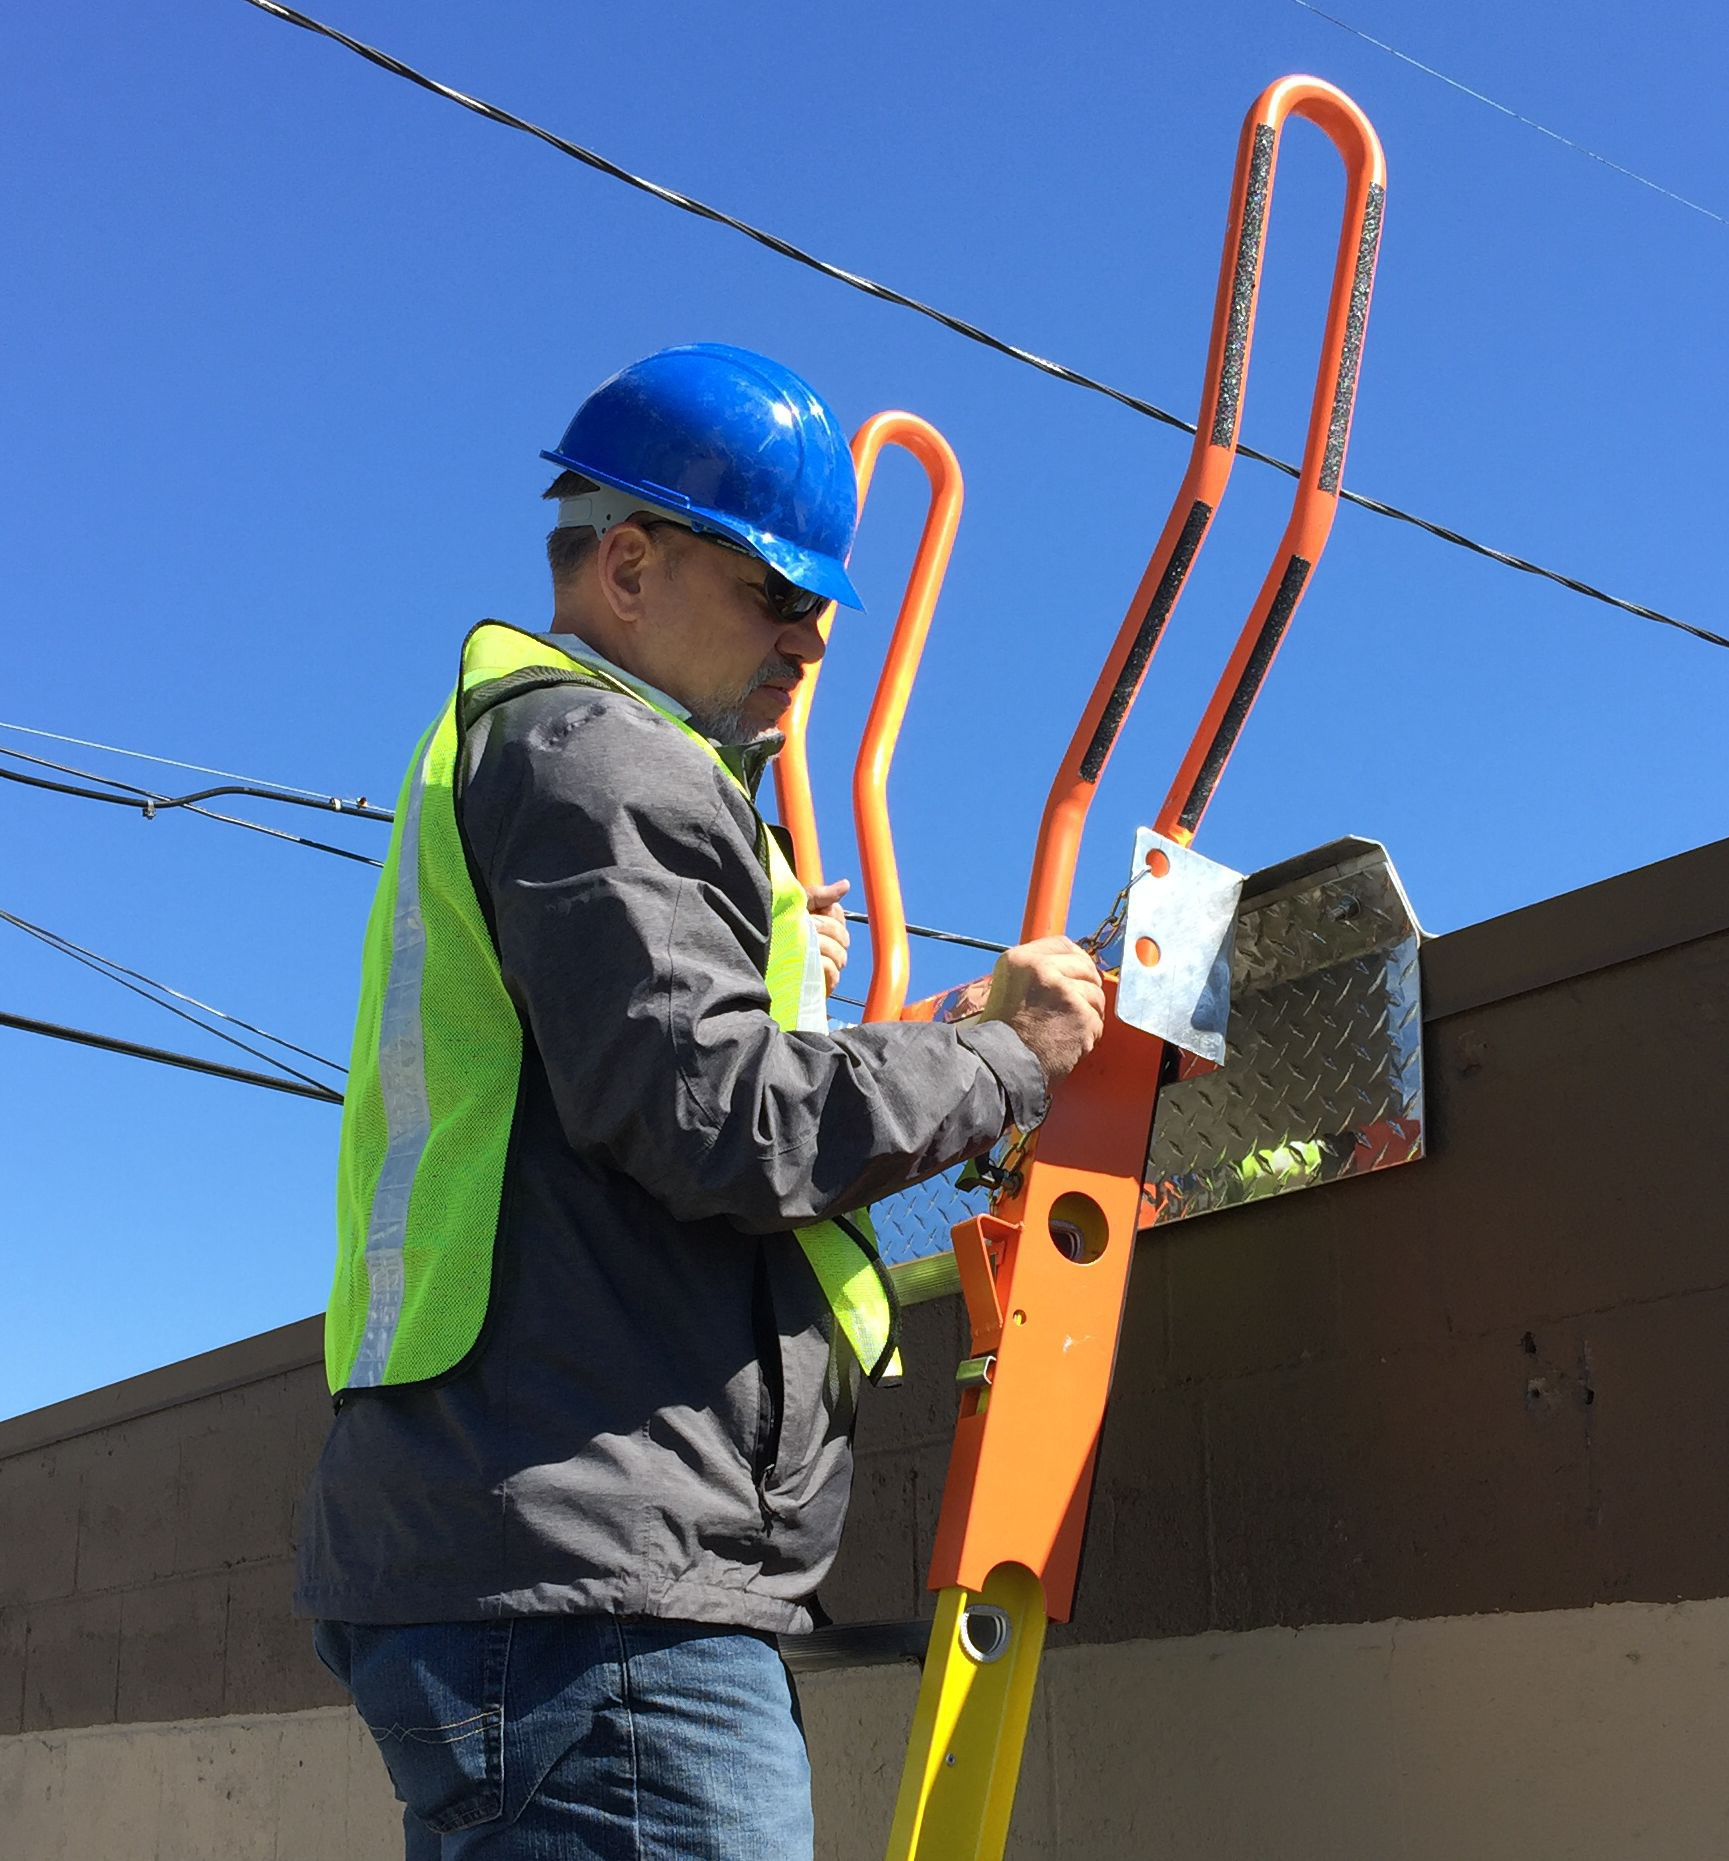 Ladder Dock Tie Off Ladder Safety Company